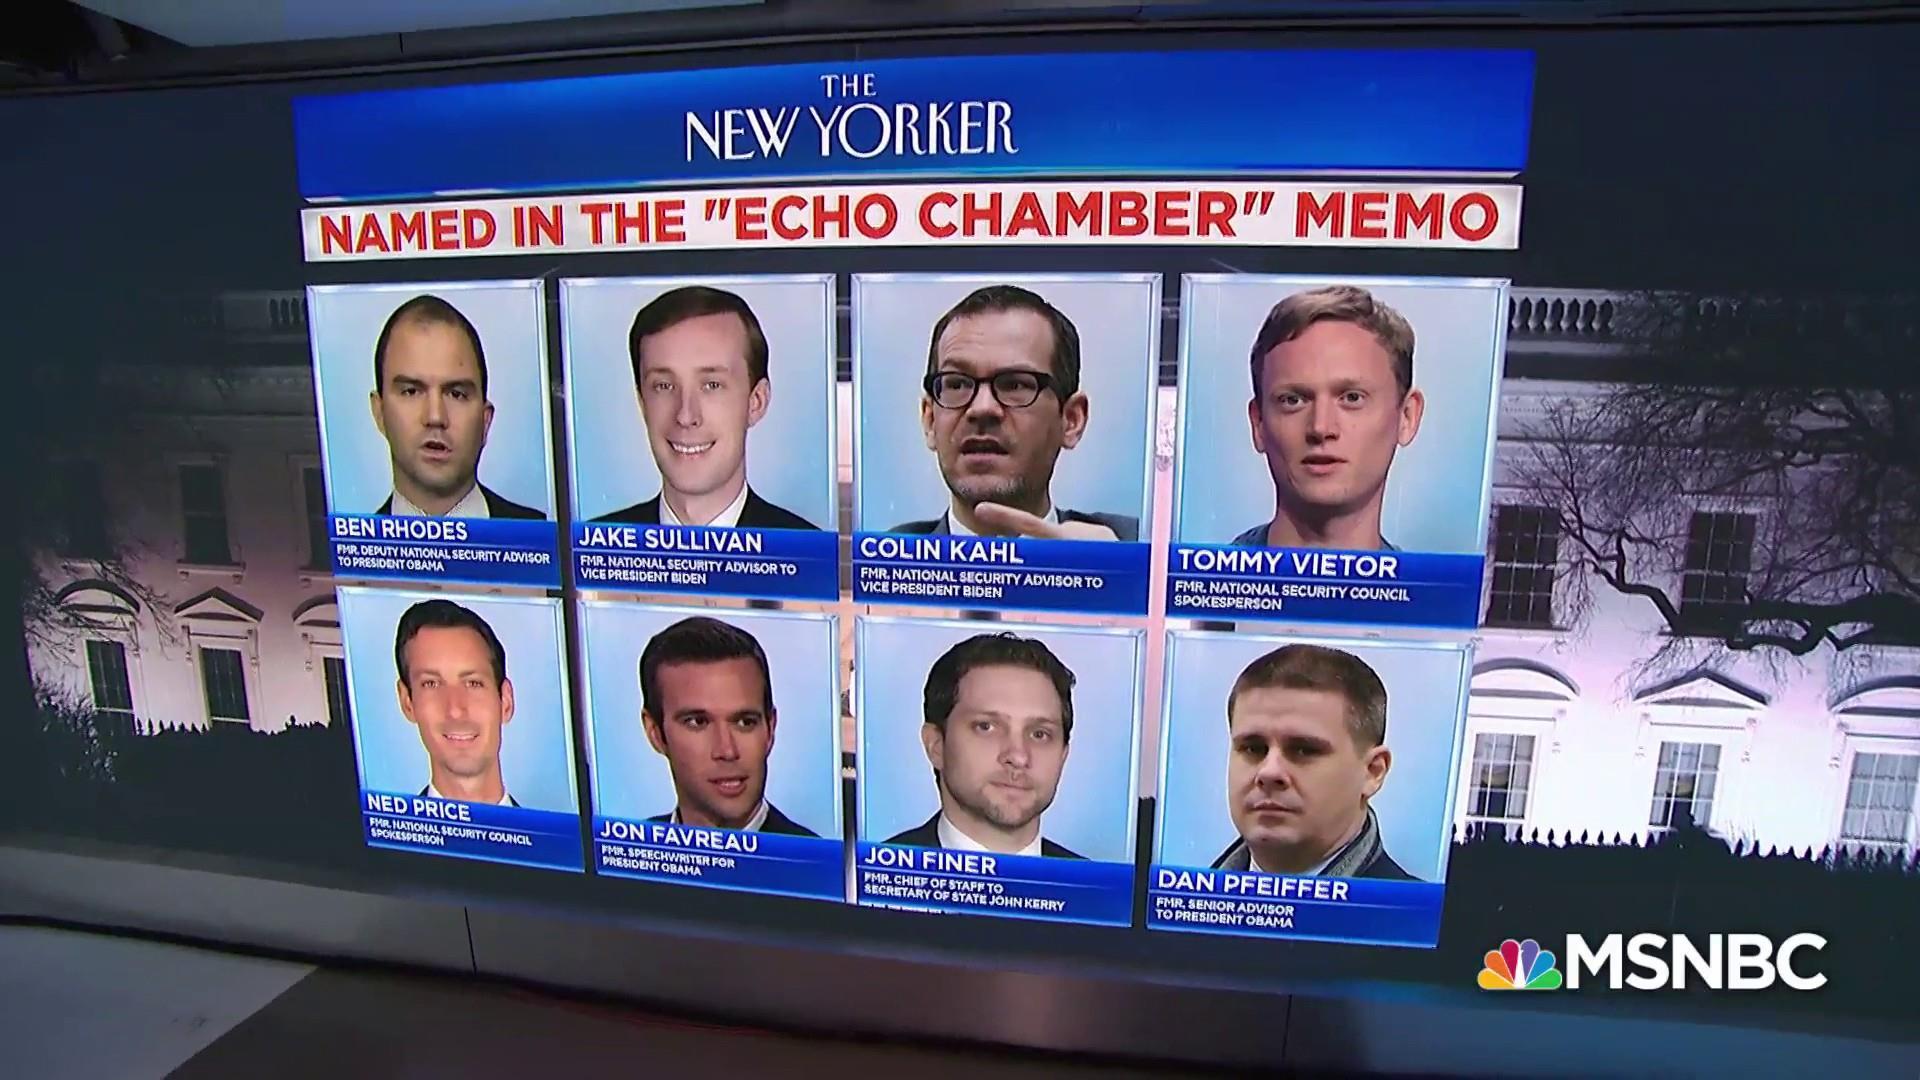 Ben Rhodes responds to  'The Echo Chamber' memo